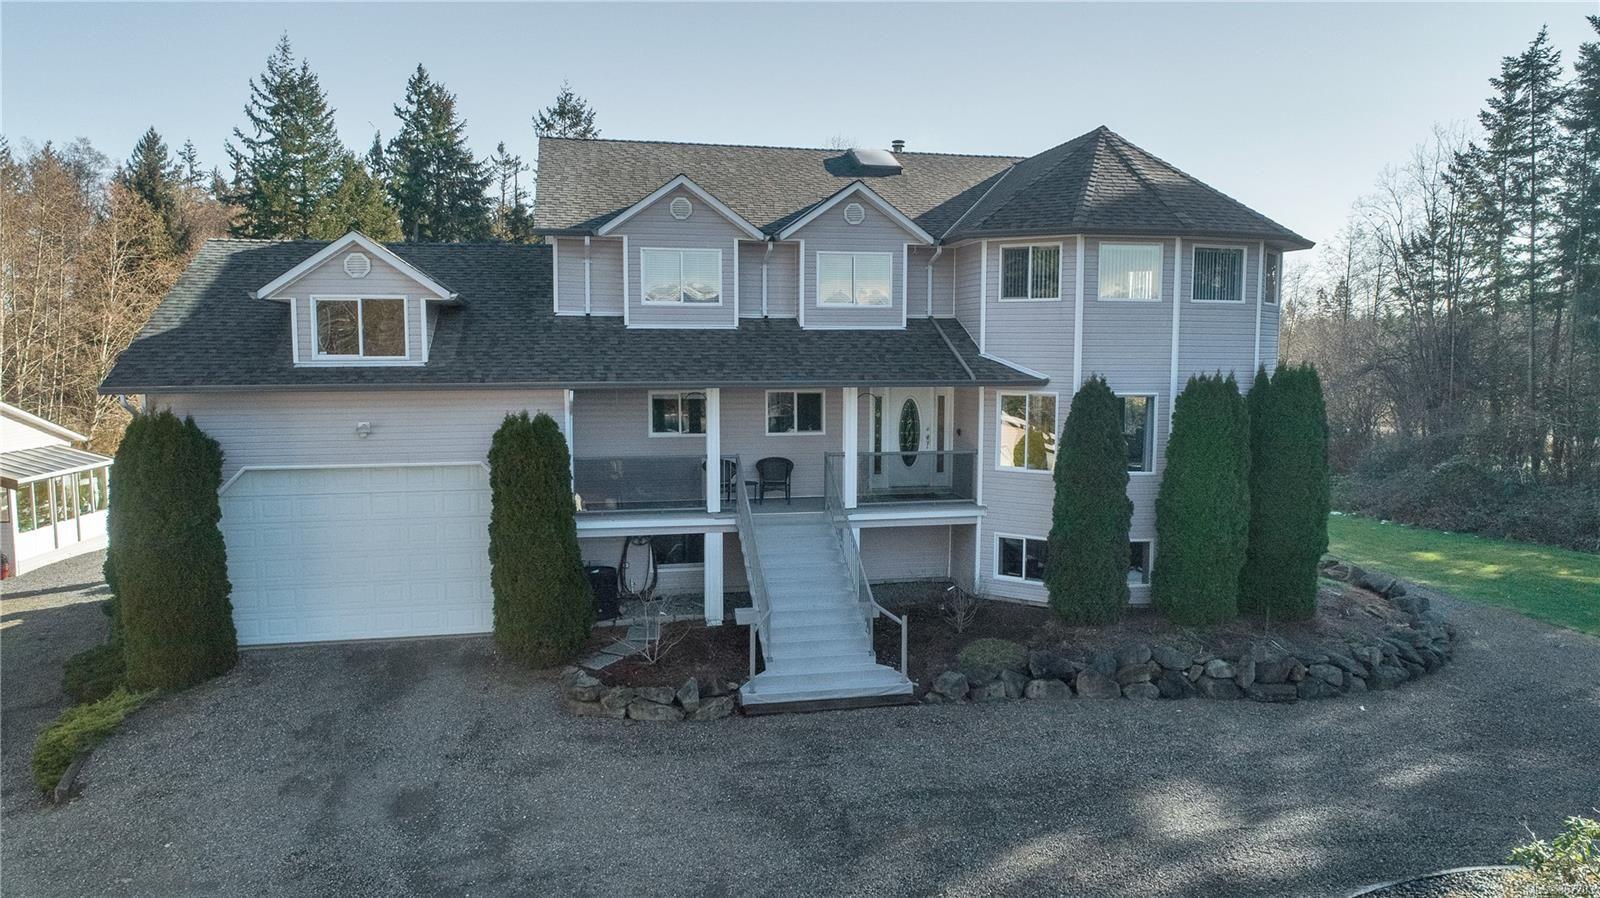 Main Photo: 2274 Anderton Rd in : CV Comox Peninsula House for sale (Comox Valley)  : MLS®# 867203